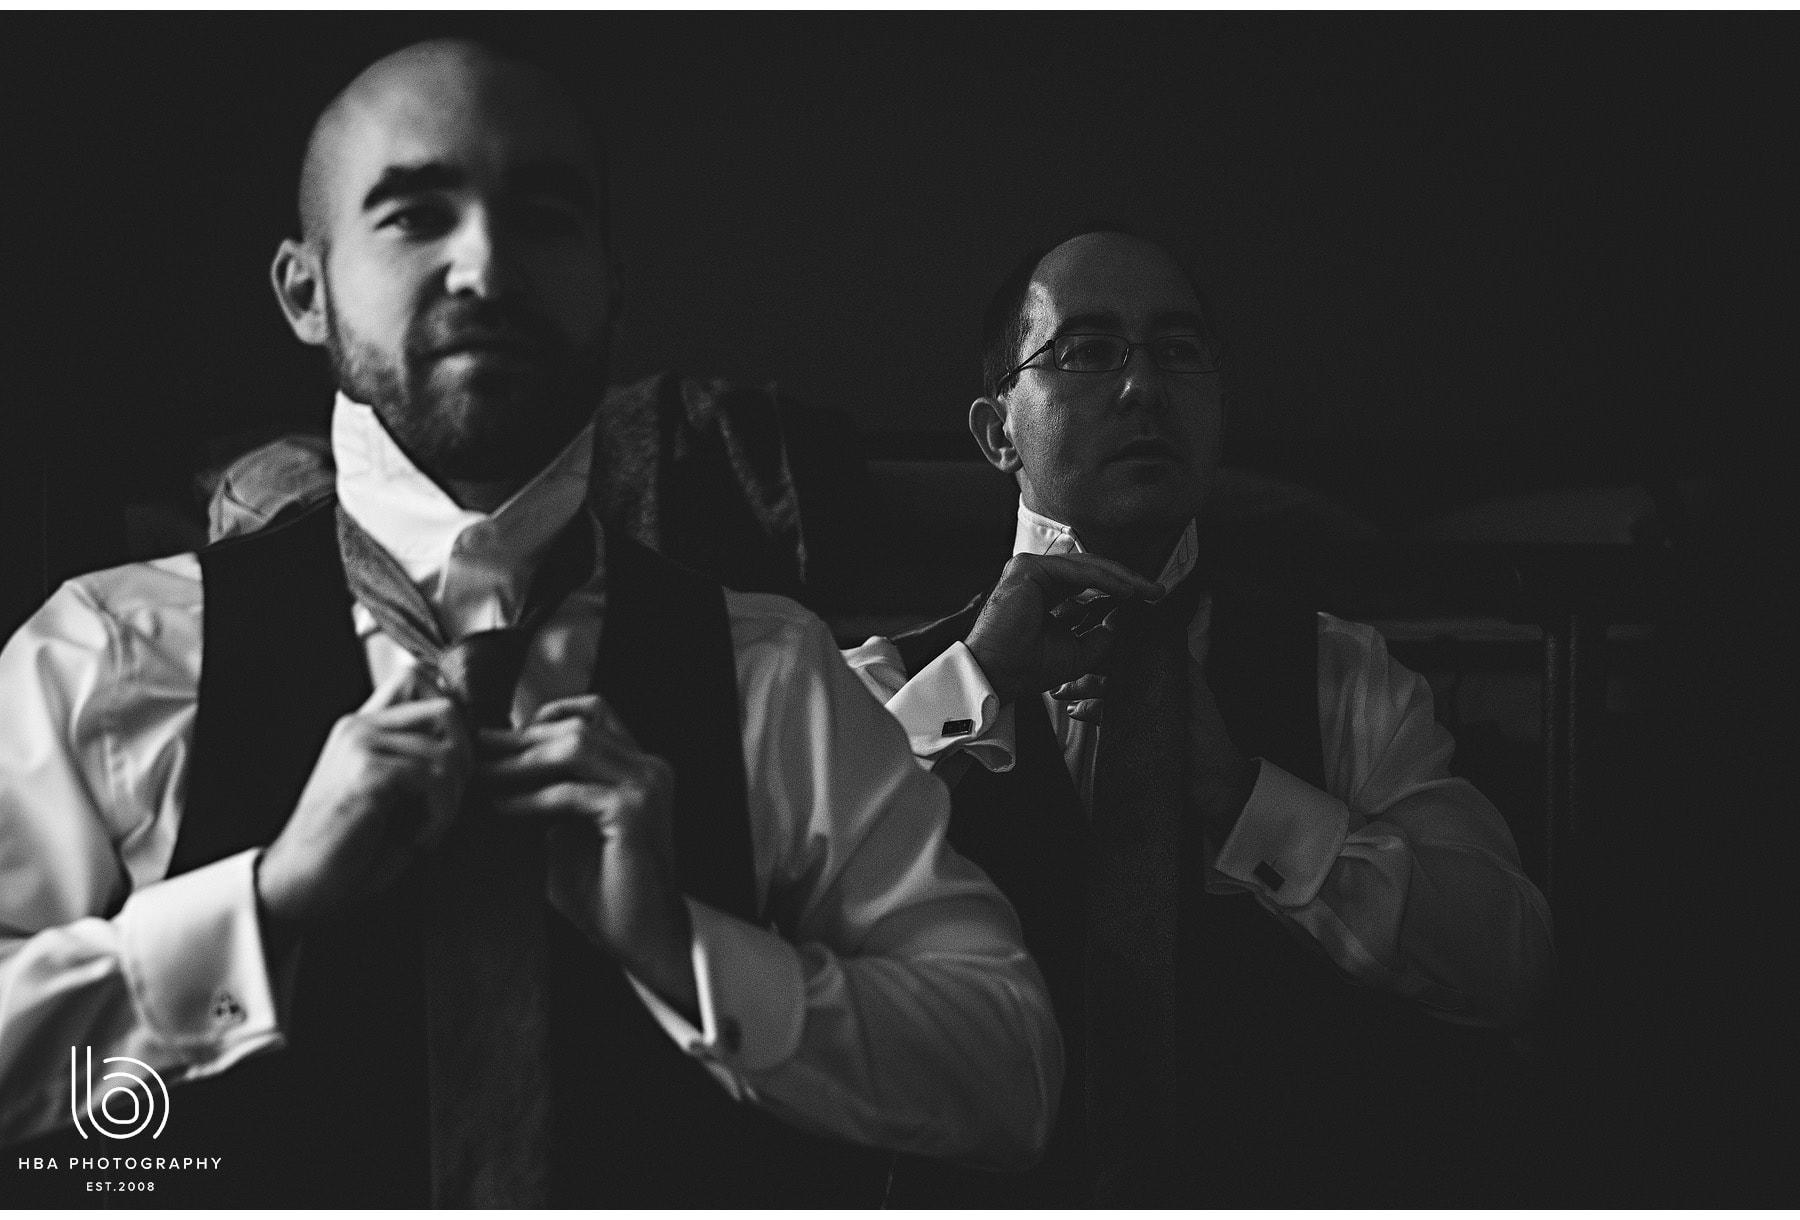 the groomsmen getting ready